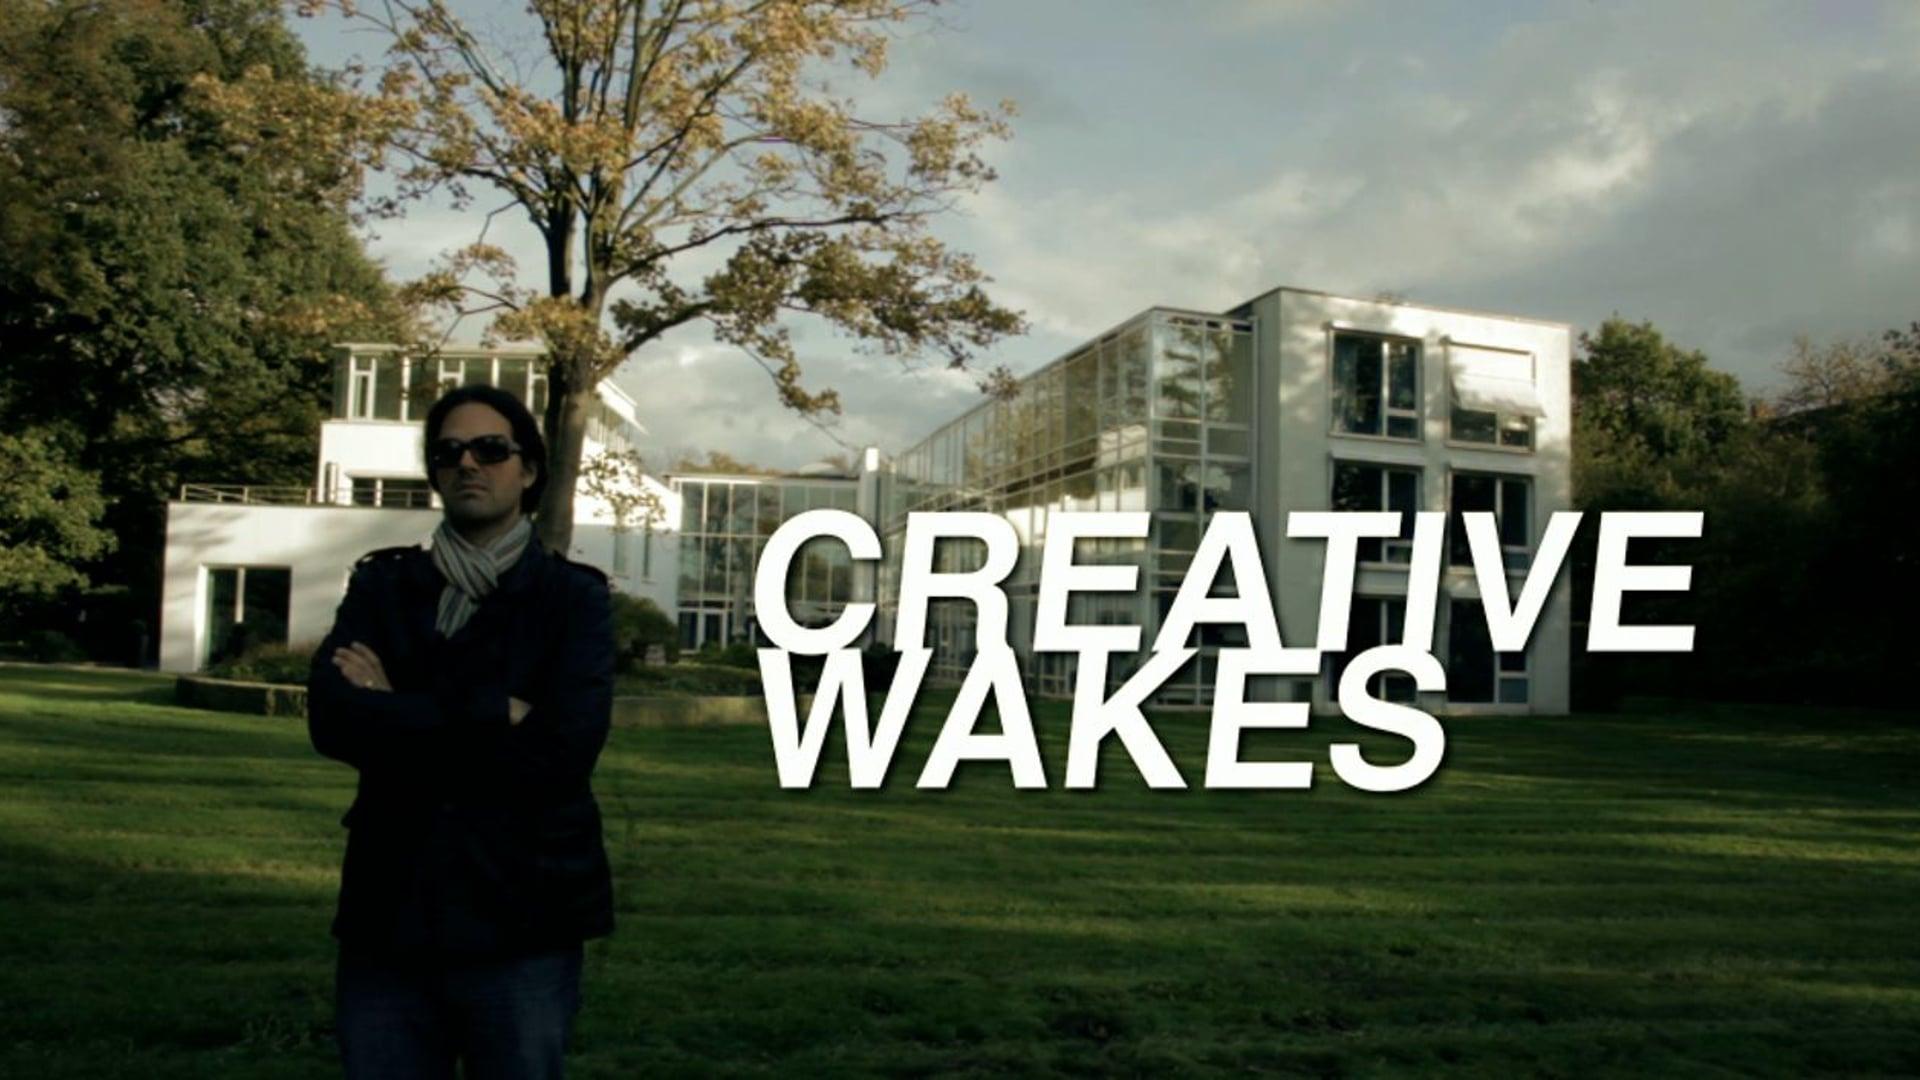 CREATIVE WAKES